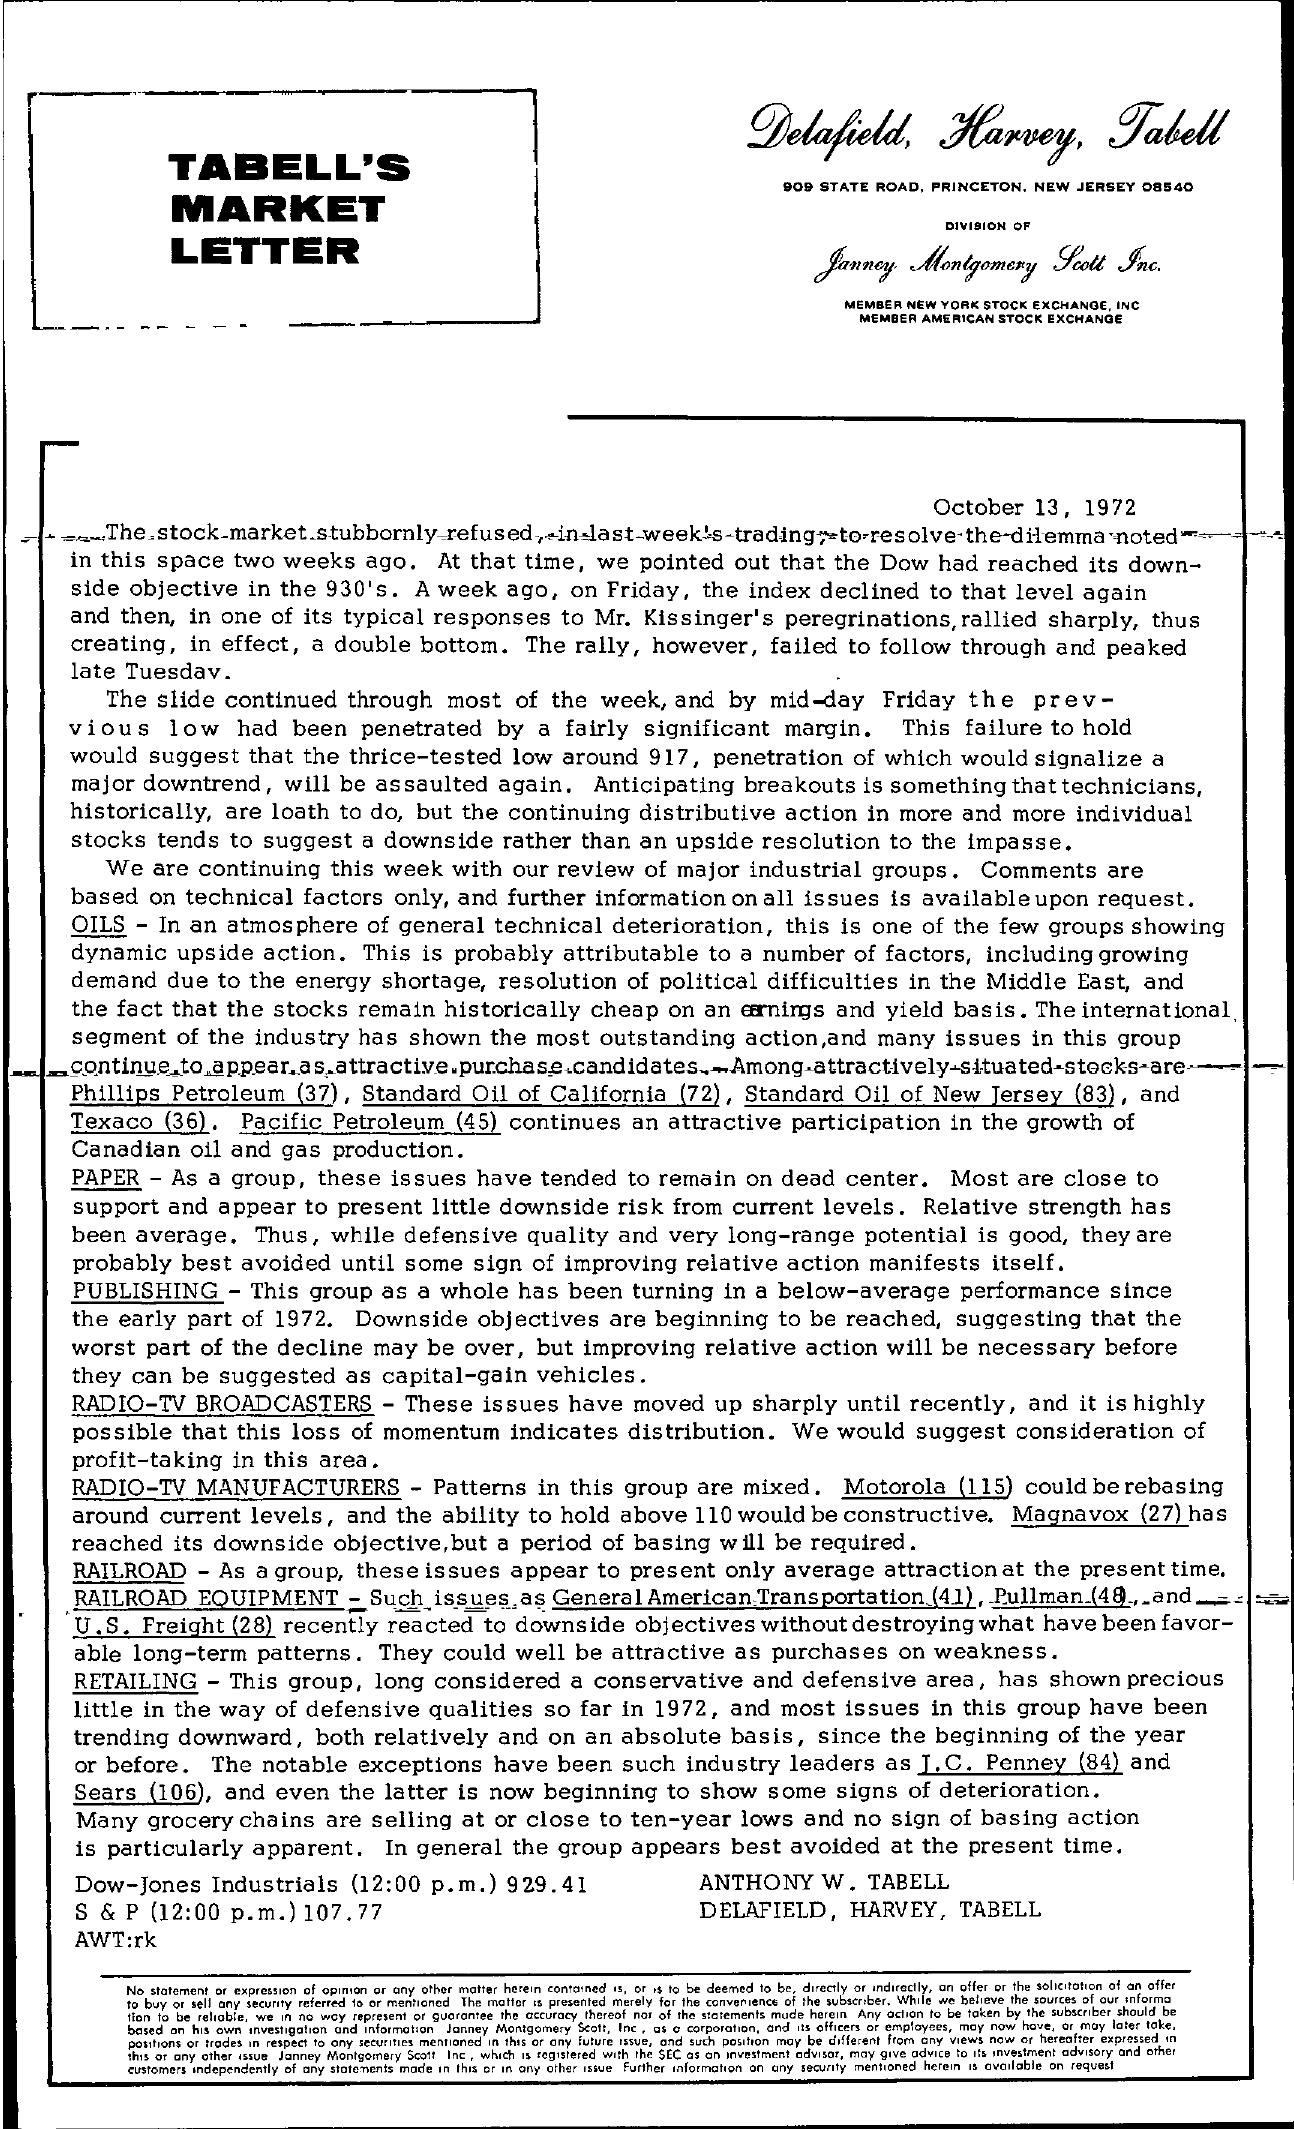 Tabell's Market Letter - October 13, 1972